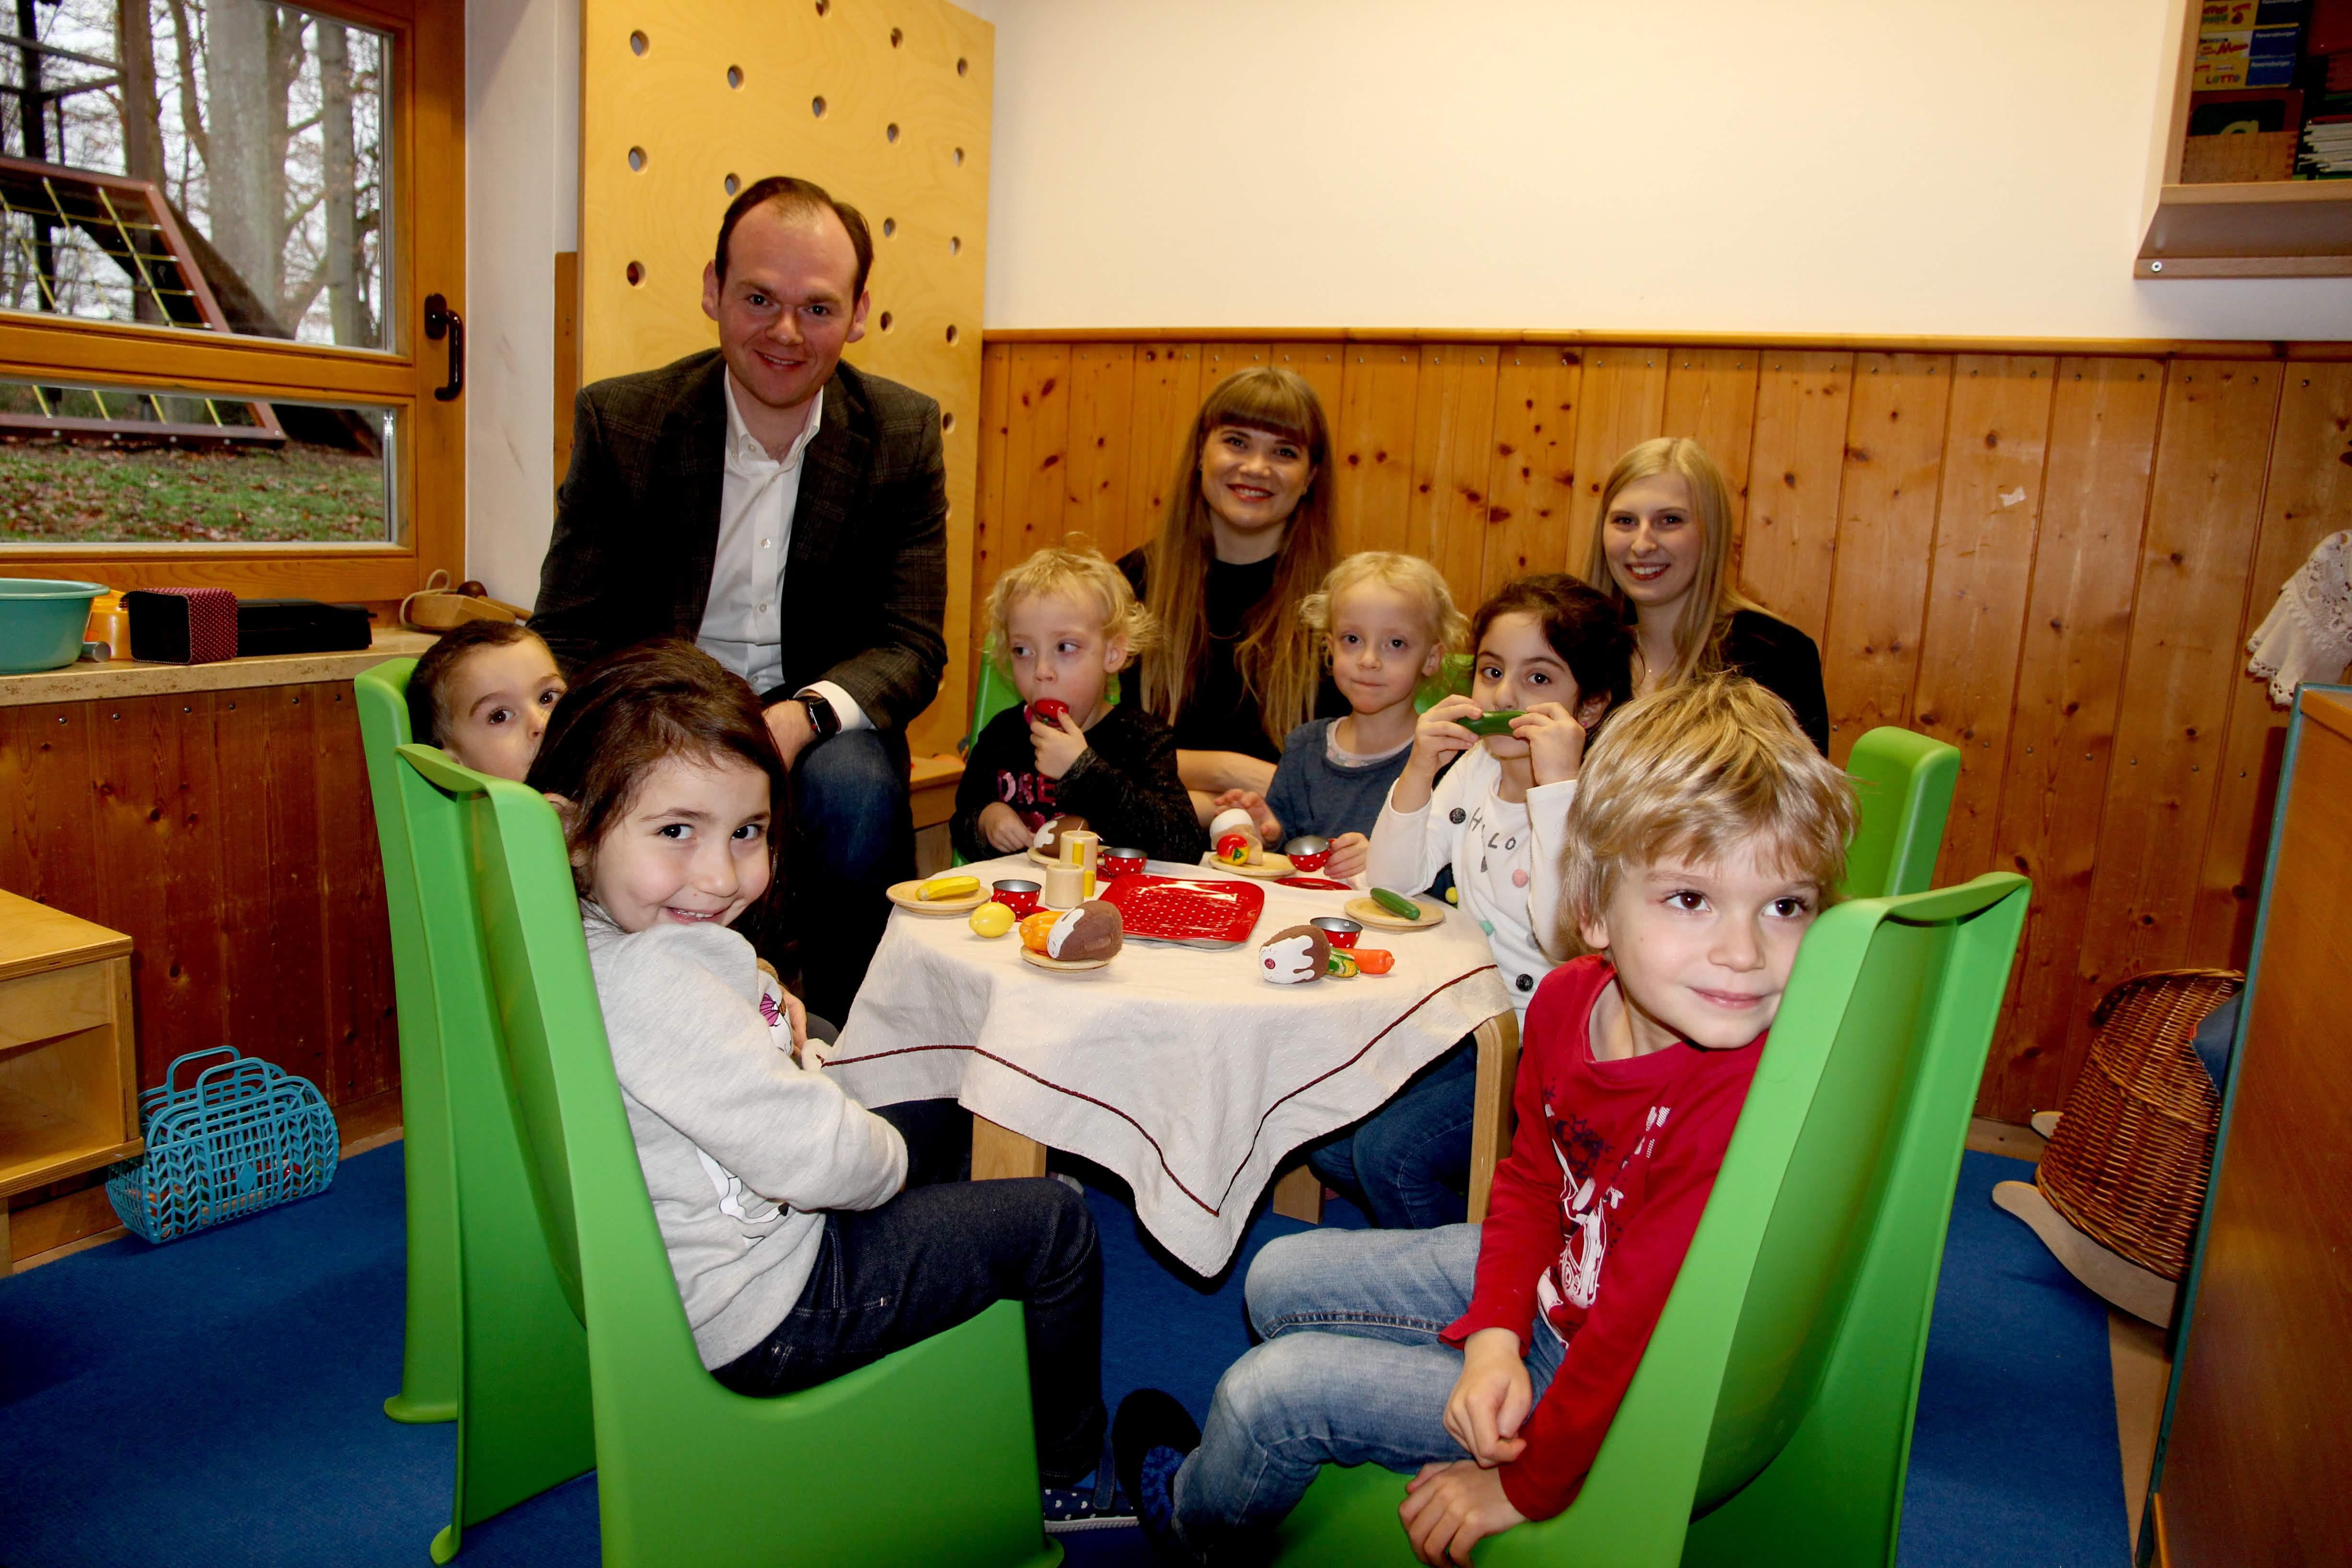 v. l. Dennis Kummarnitzky (Lebenshilfe Nürnberger Land), Hanna Matheis, Christina Birkmann (Firma Löffler), und Kinder der Mäusegruppe im Spieleck beim Brunch.